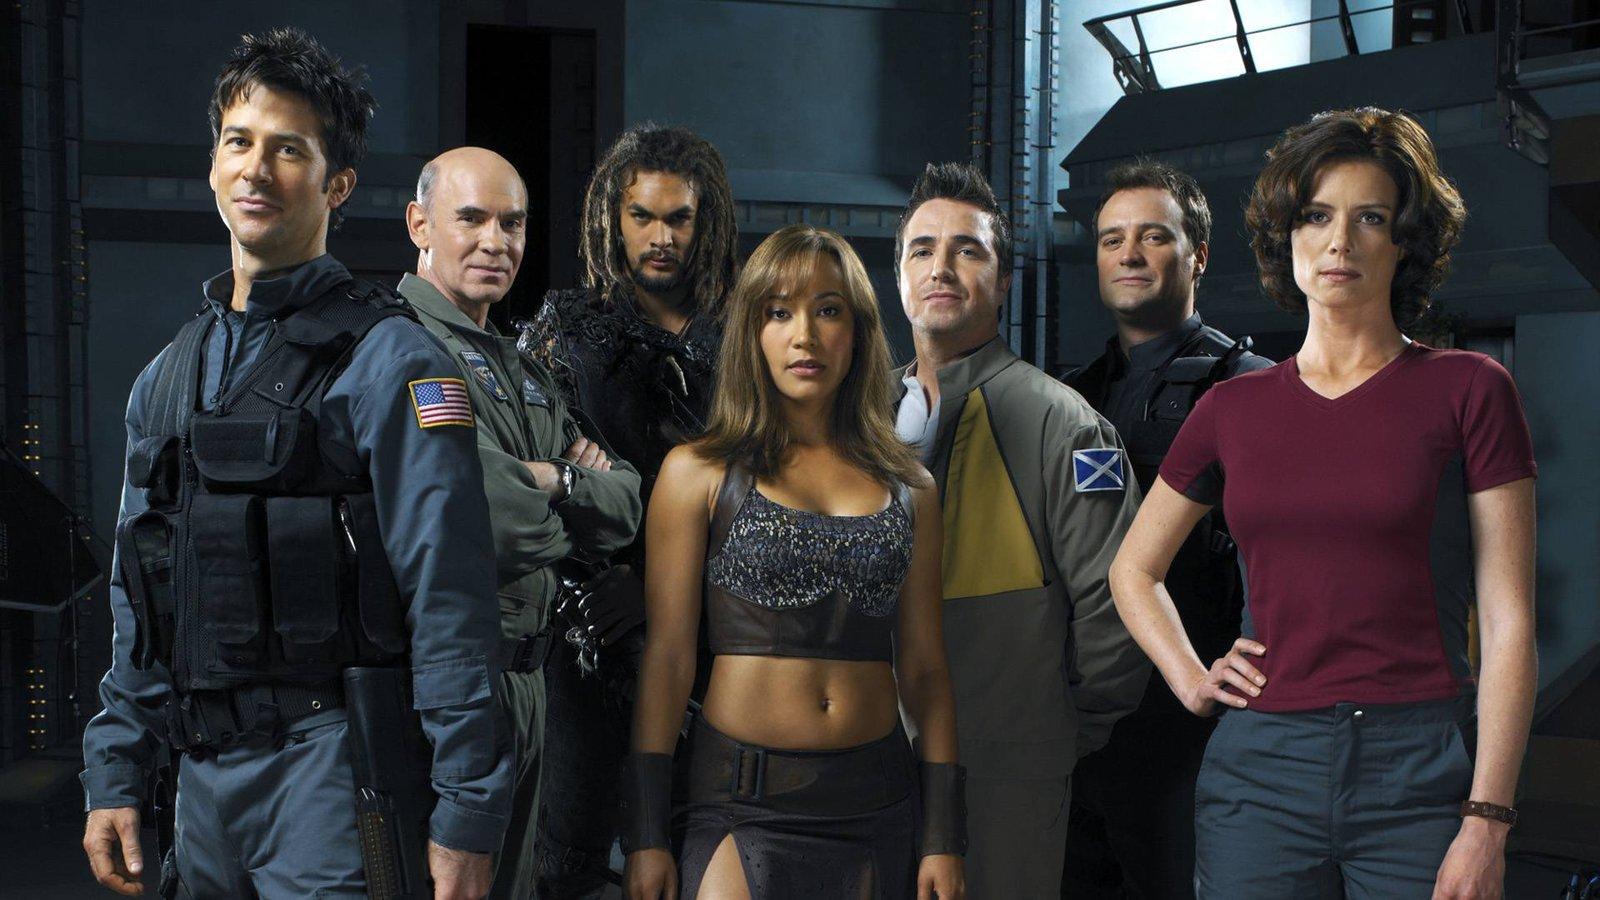 Звездные врата: Атлантида - 2 сезон